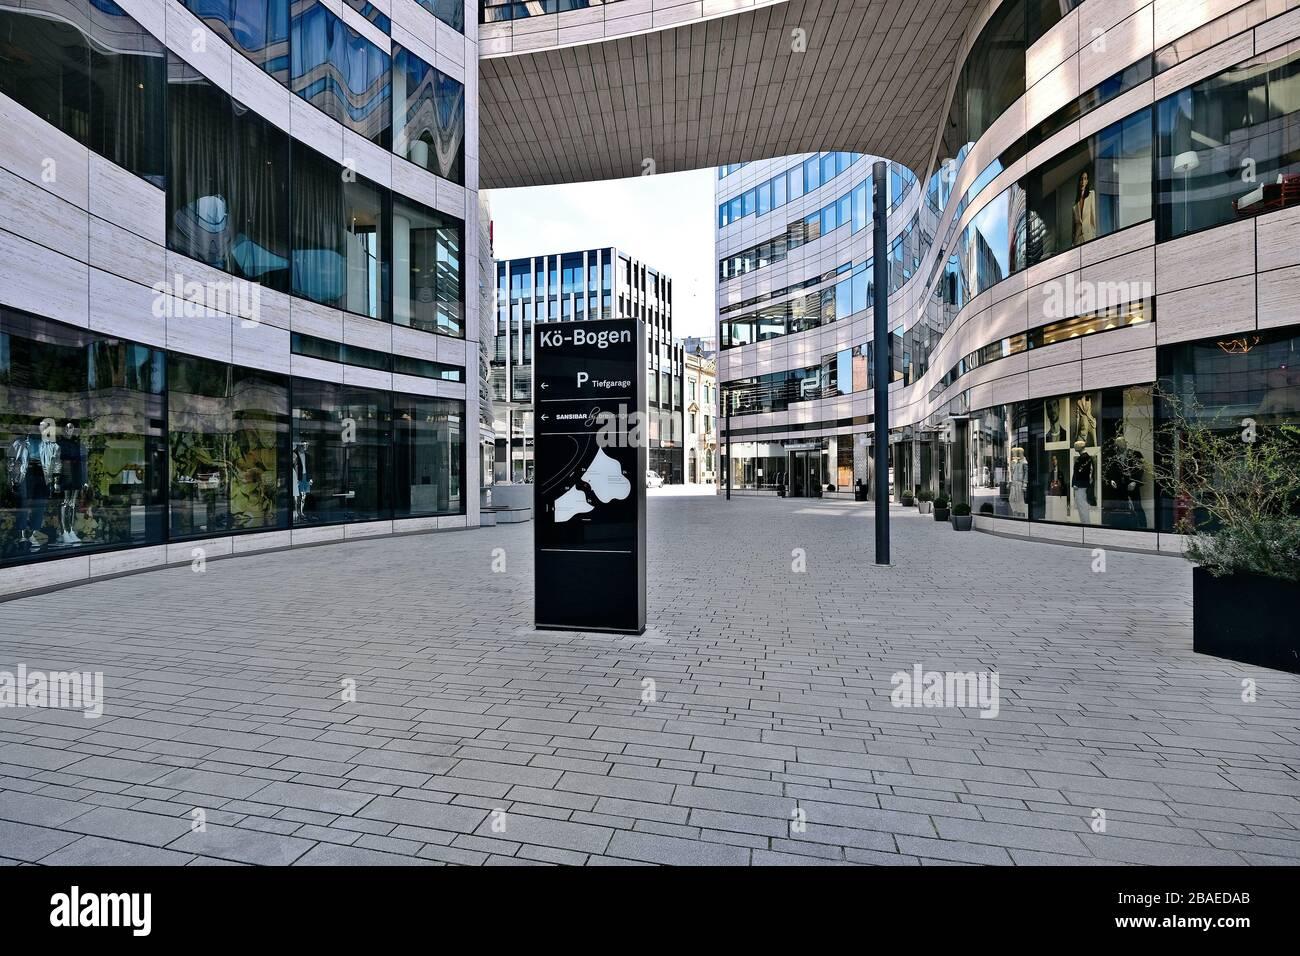 Leere Straßen in Düsseldorf während der Corona-Krise, Kö-Bogen Stockfoto